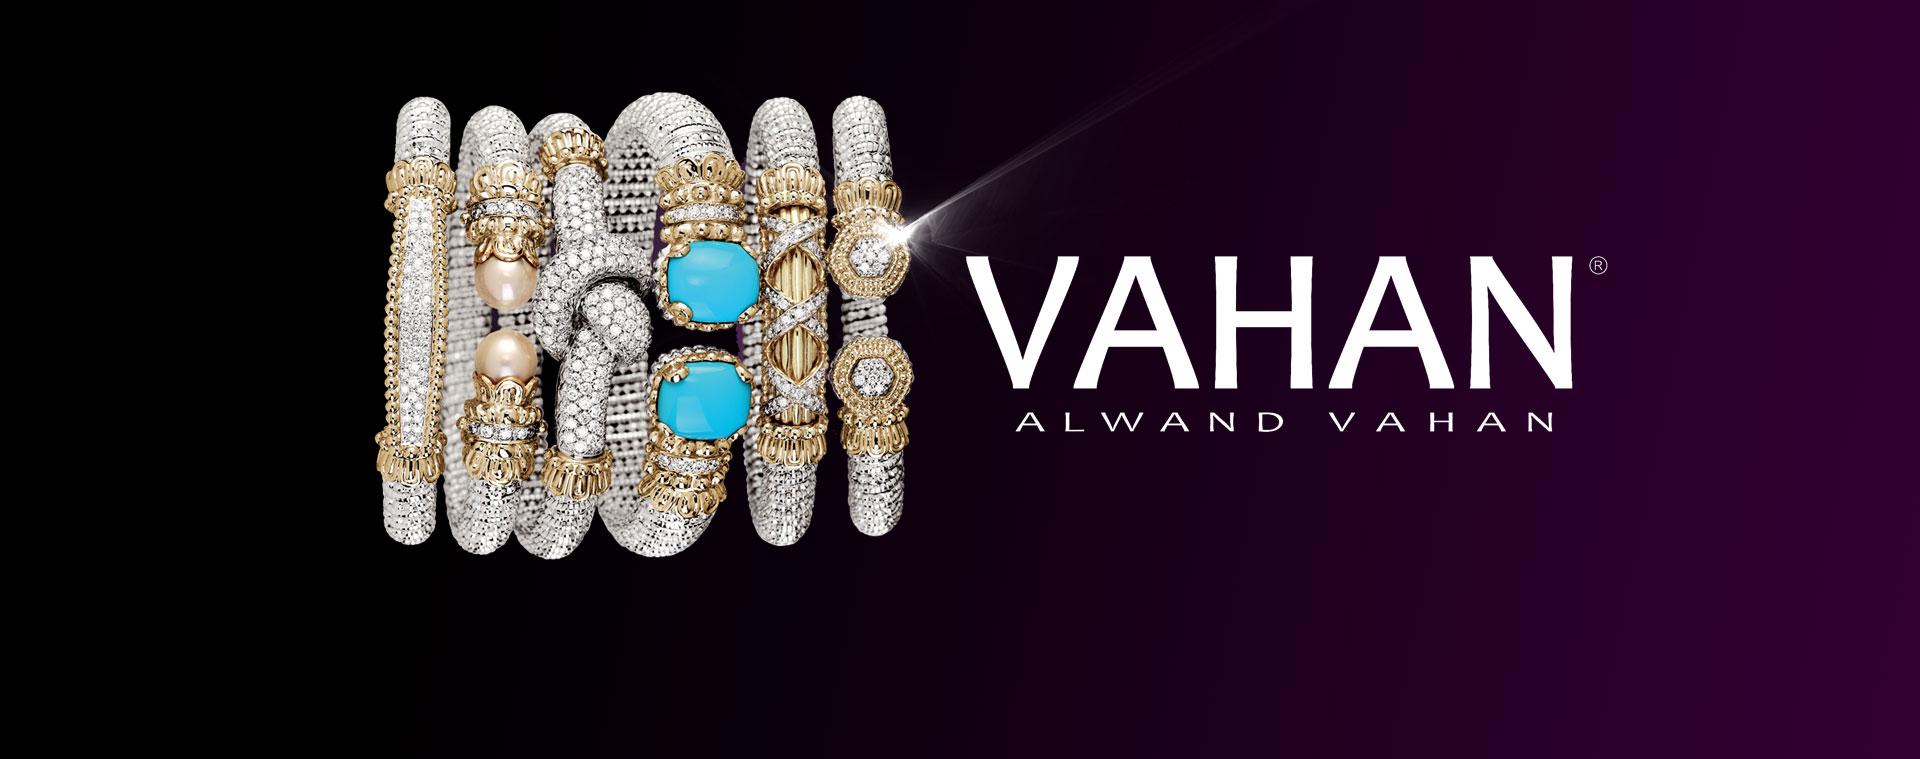 Alwand Vahan Luxury Jewelry